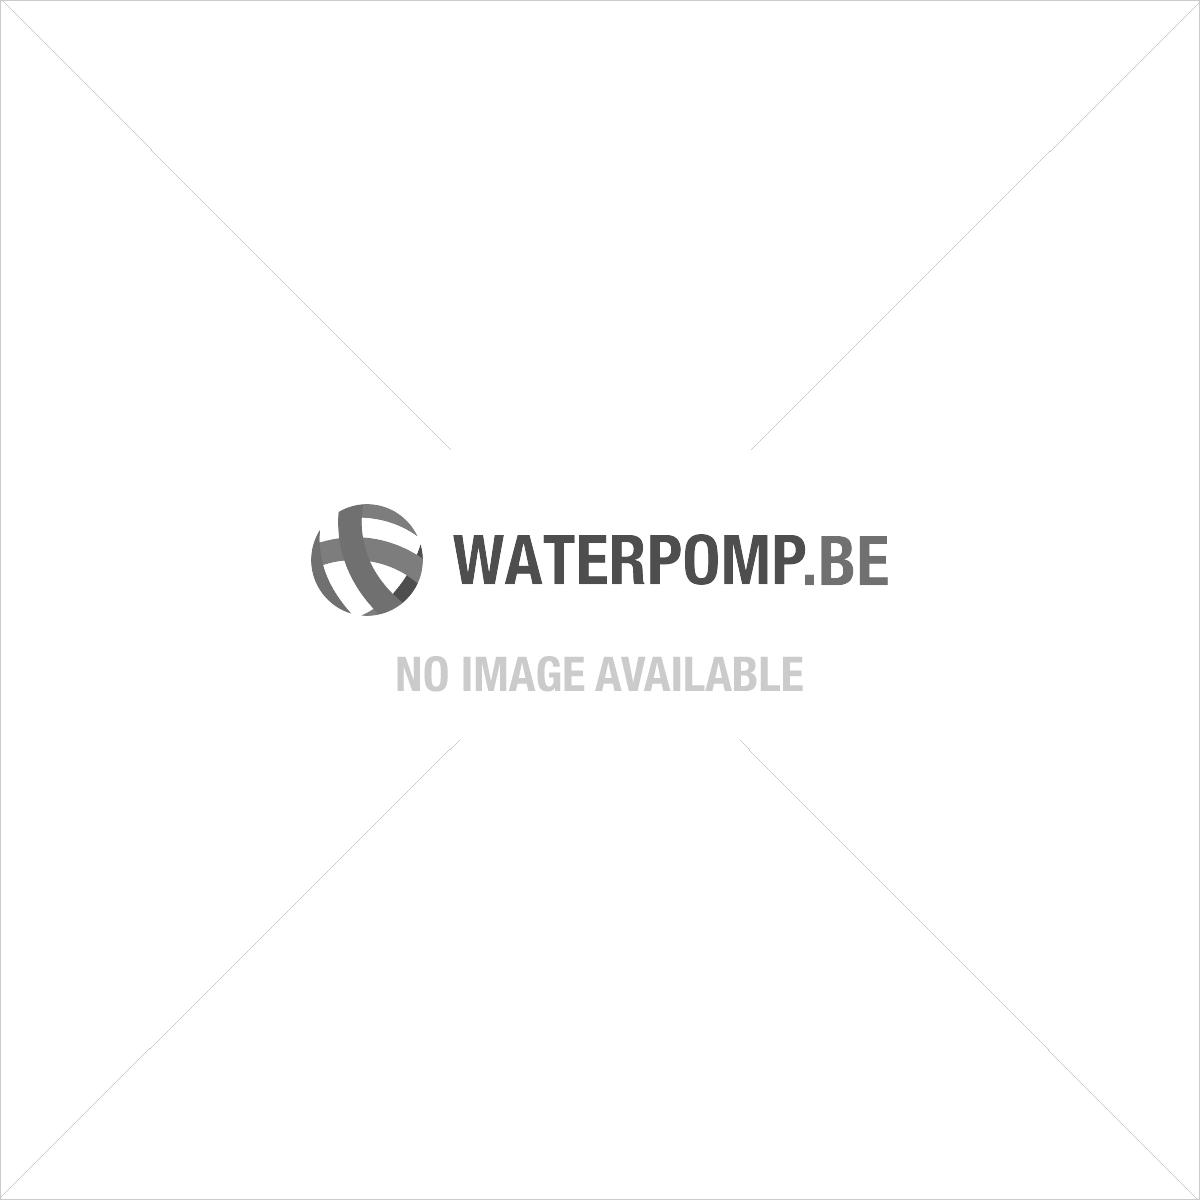 grundfos alpha2 25 40 180 circulatiepomp cv pomp waterpomp. Black Bedroom Furniture Sets. Home Design Ideas